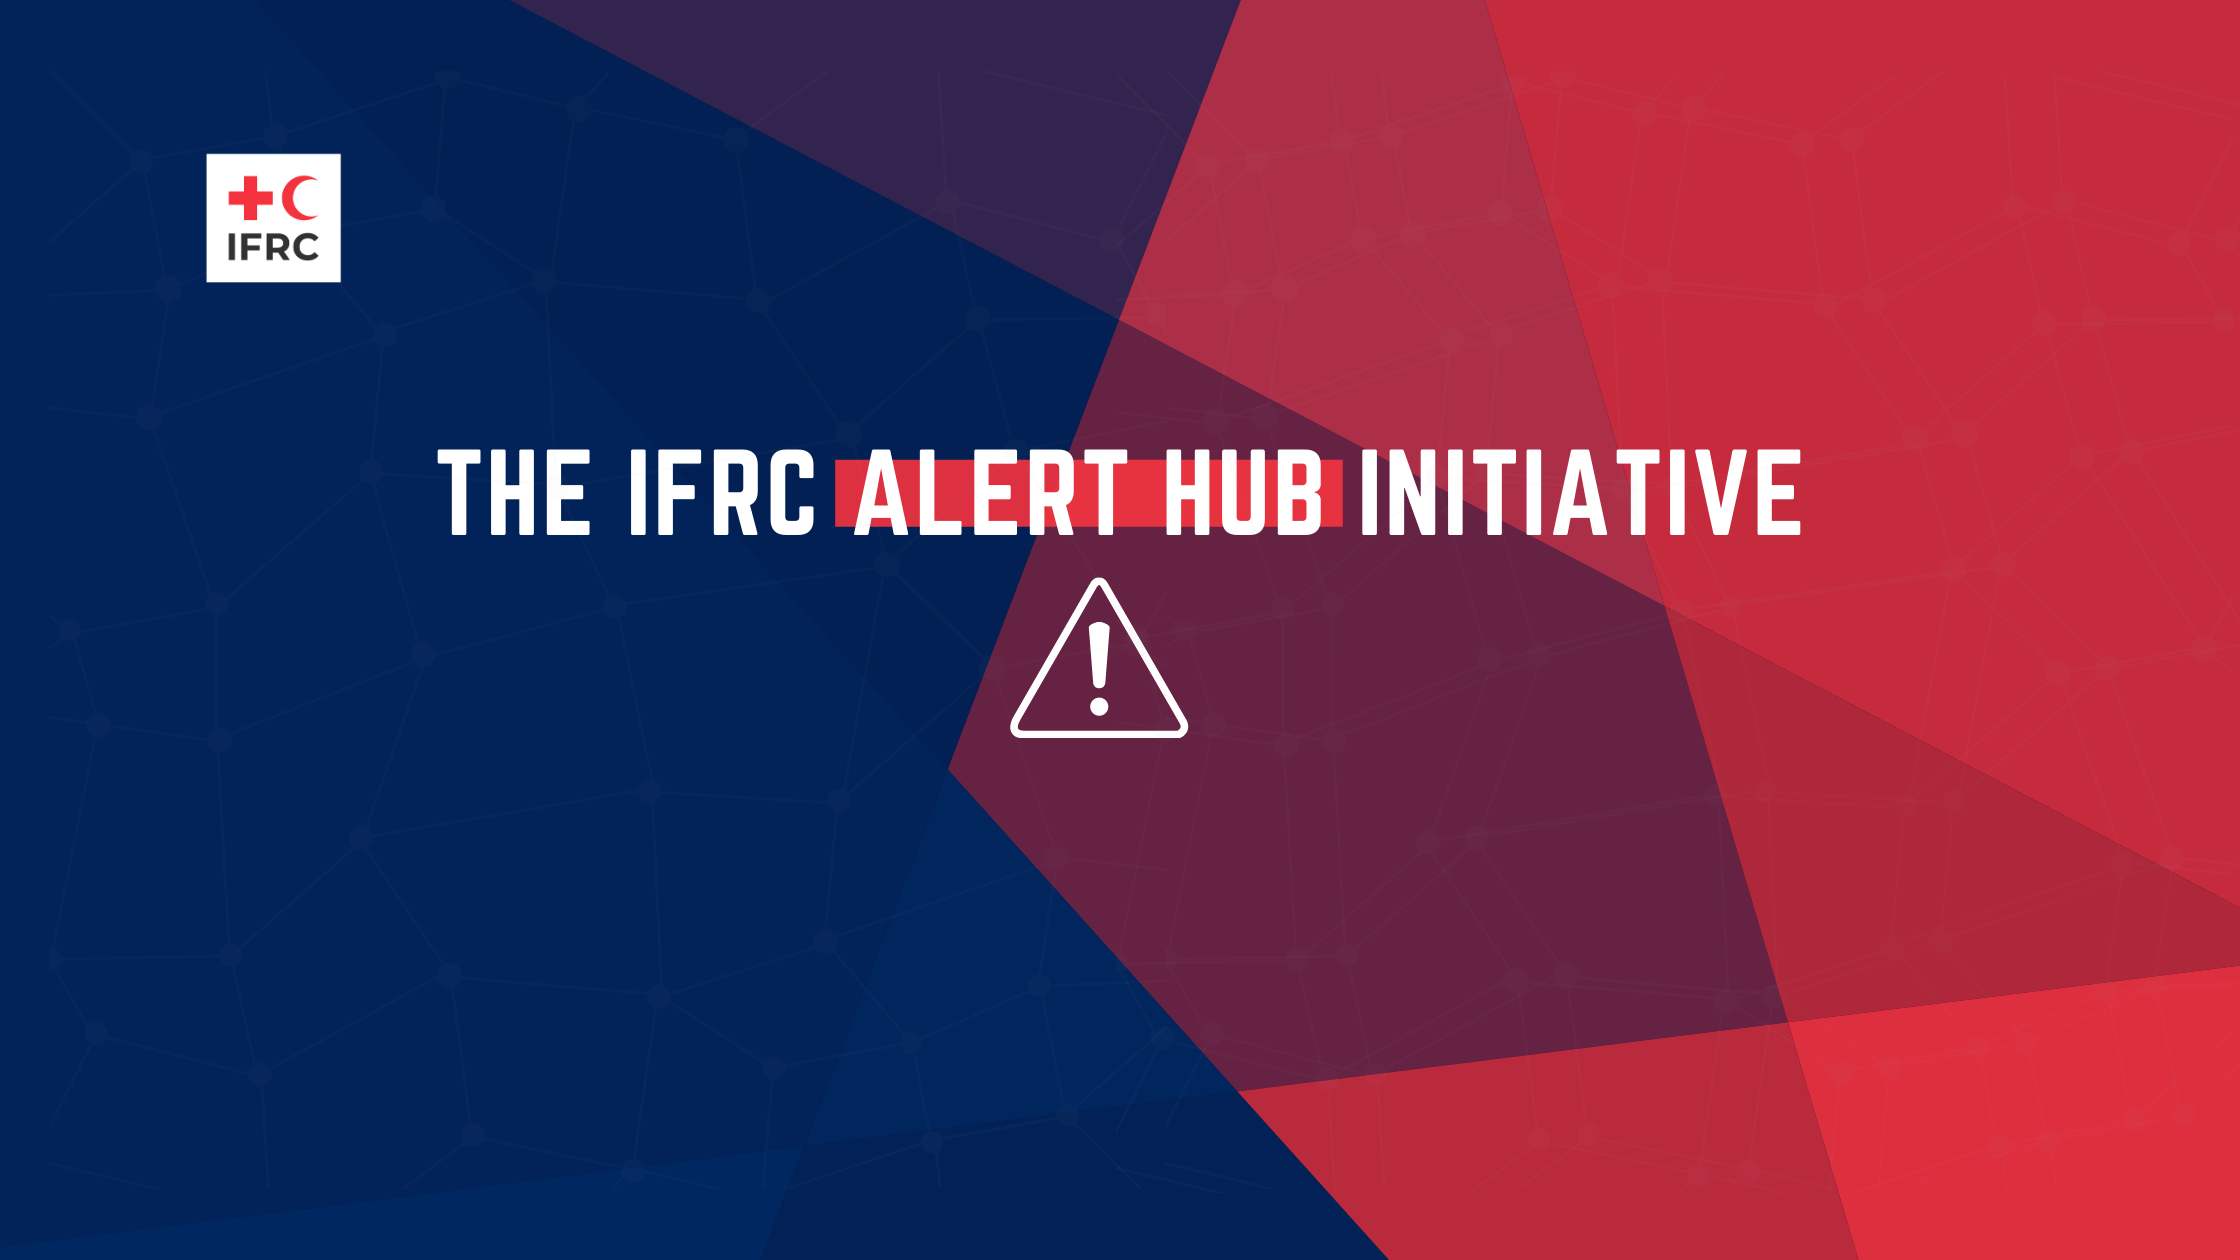 IFRC Alert Hub Initiative